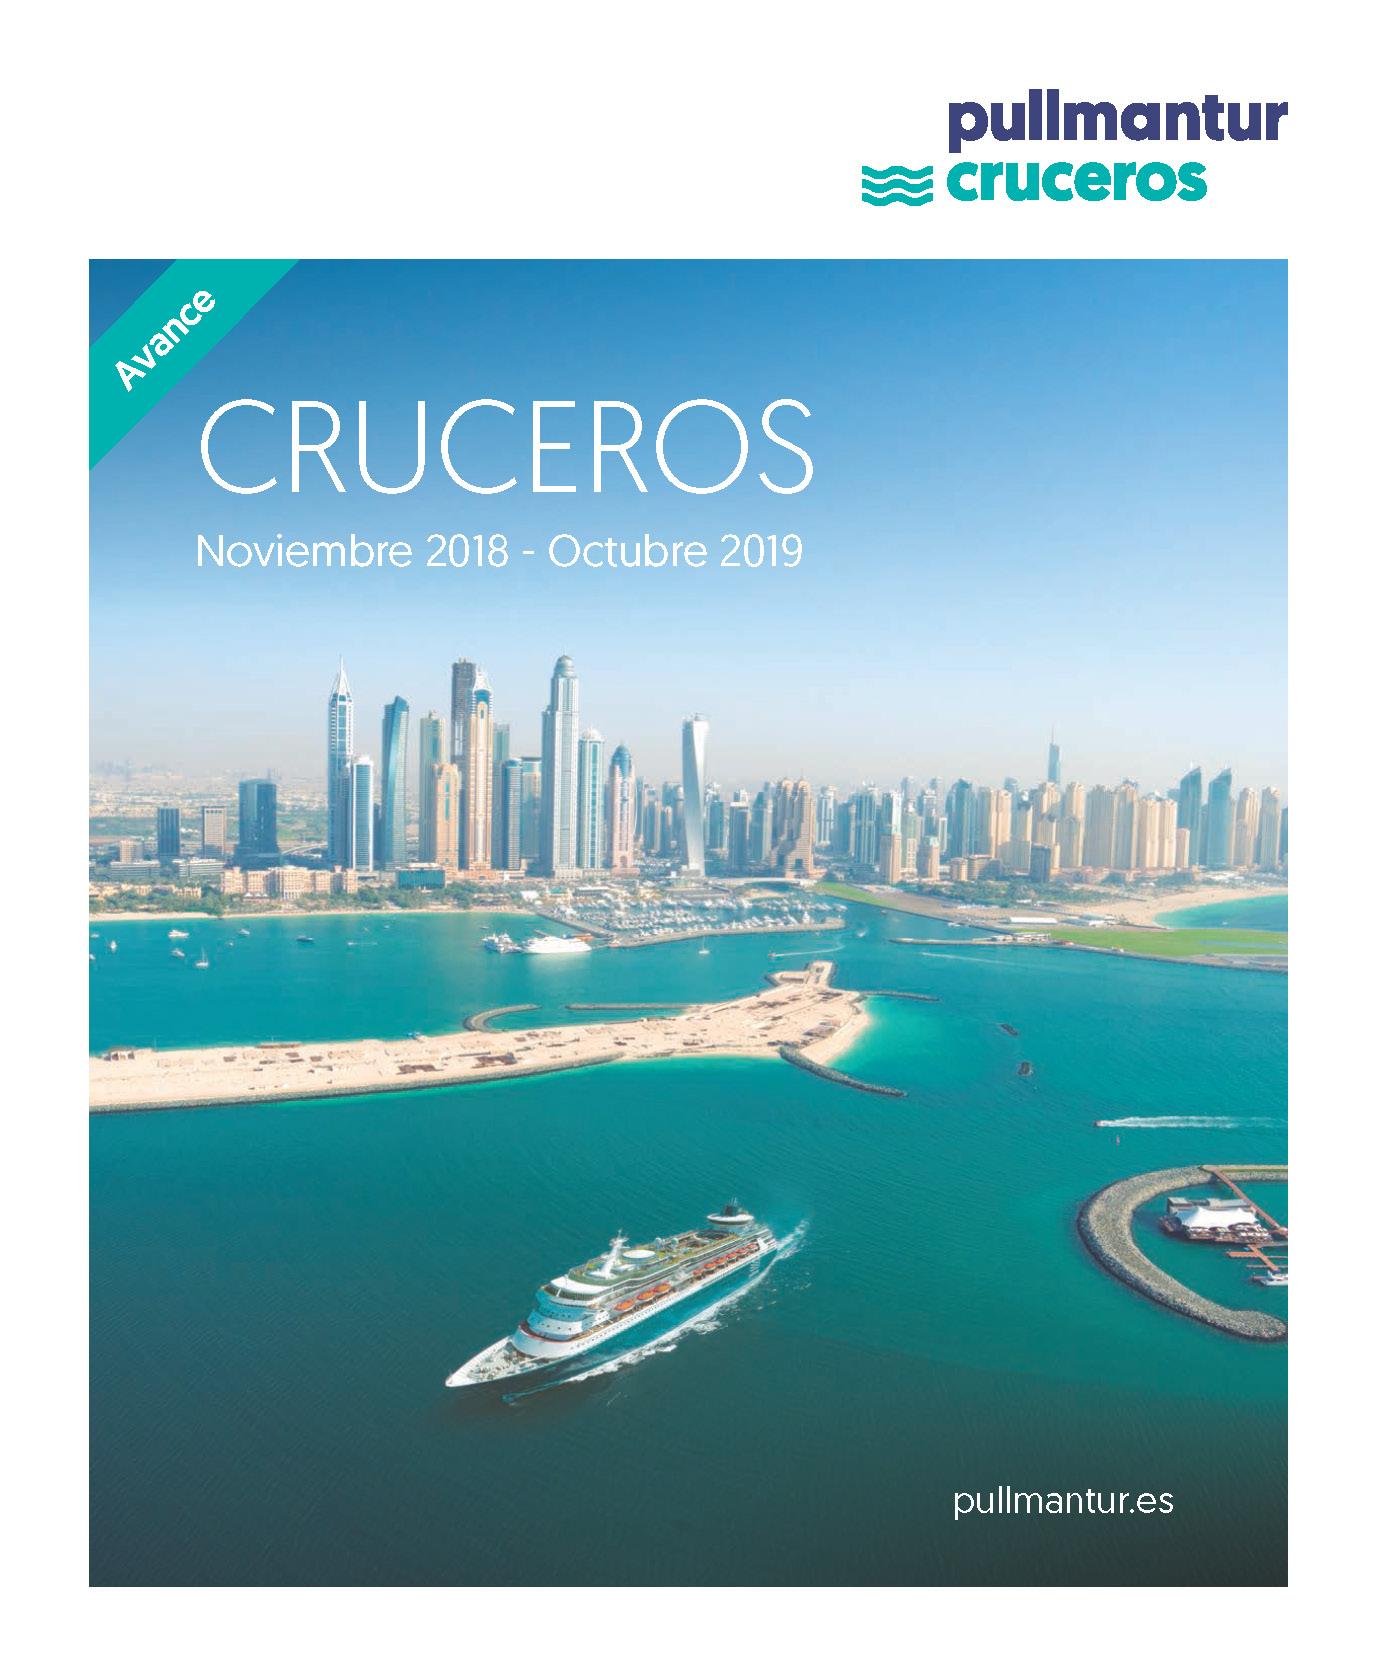 Catalogo Pullmantur Cruceros 2018-2019 Avance